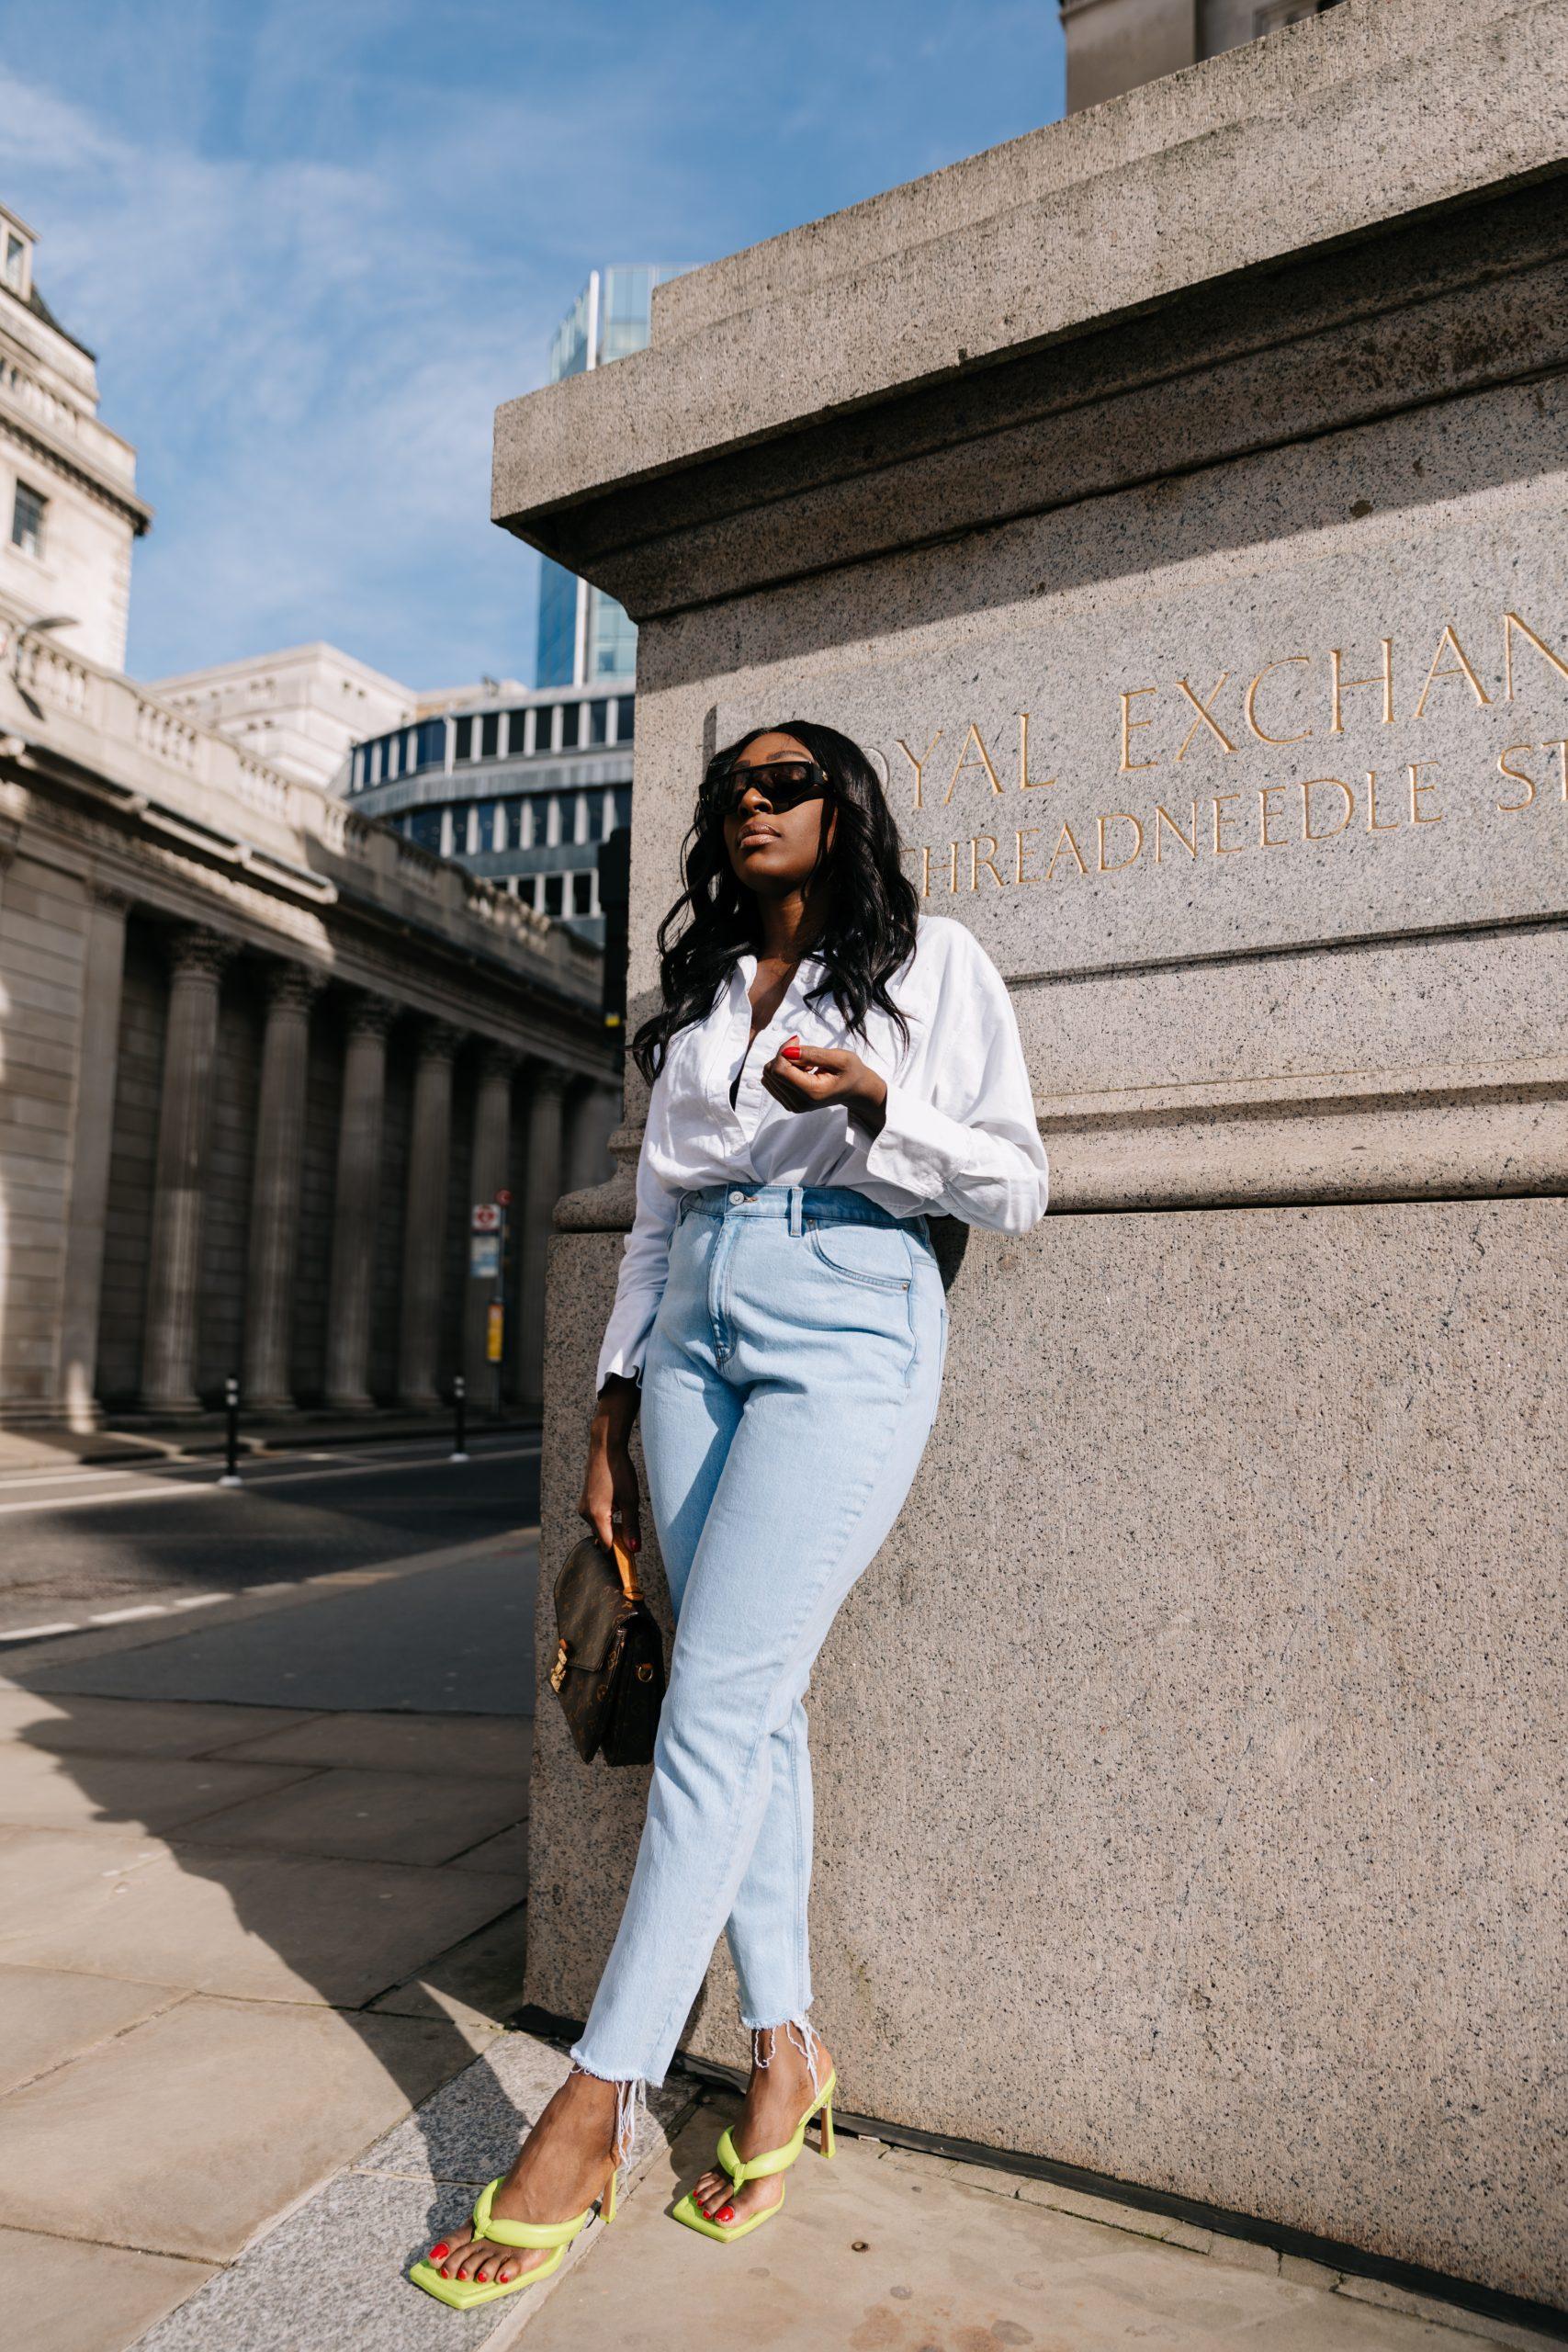 High Waisted Jeans & Denim Trends - high waisted jeans - bottega veneta sunglasses 2 straight leg jeans - Tasha Antwi